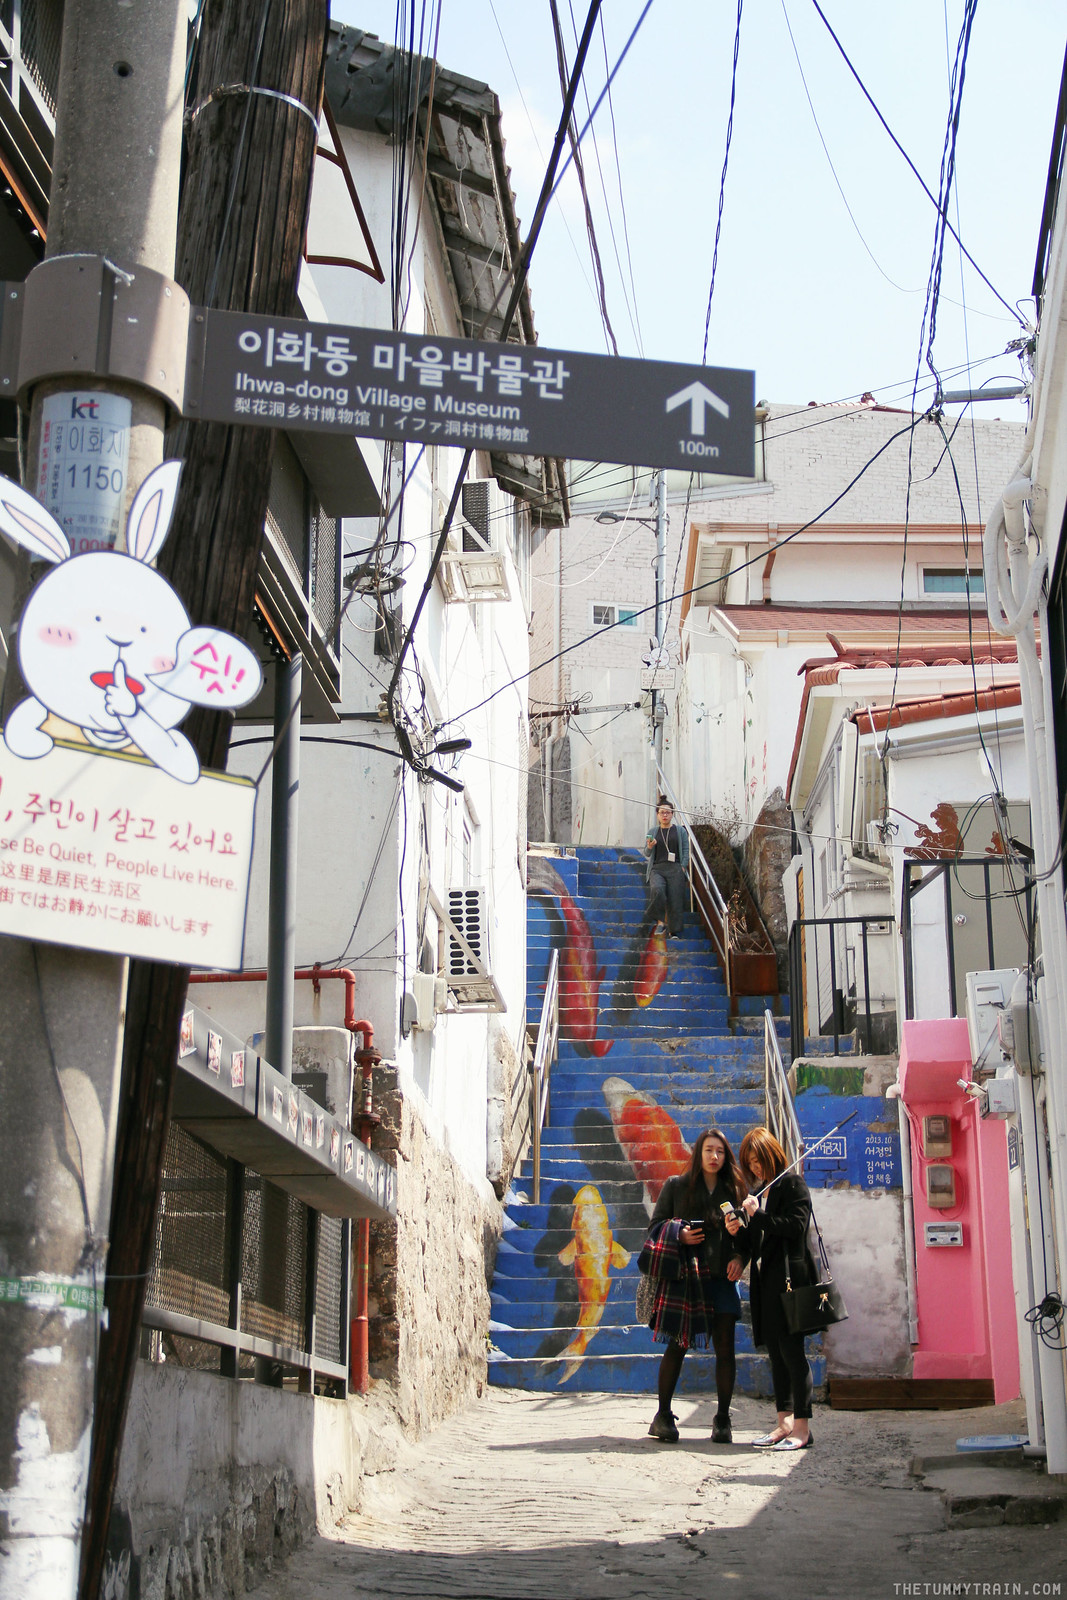 33467875712 6f30ea405b h - Seoul-ful Spring 2016: A mini exploration of Ihwa Mural Village